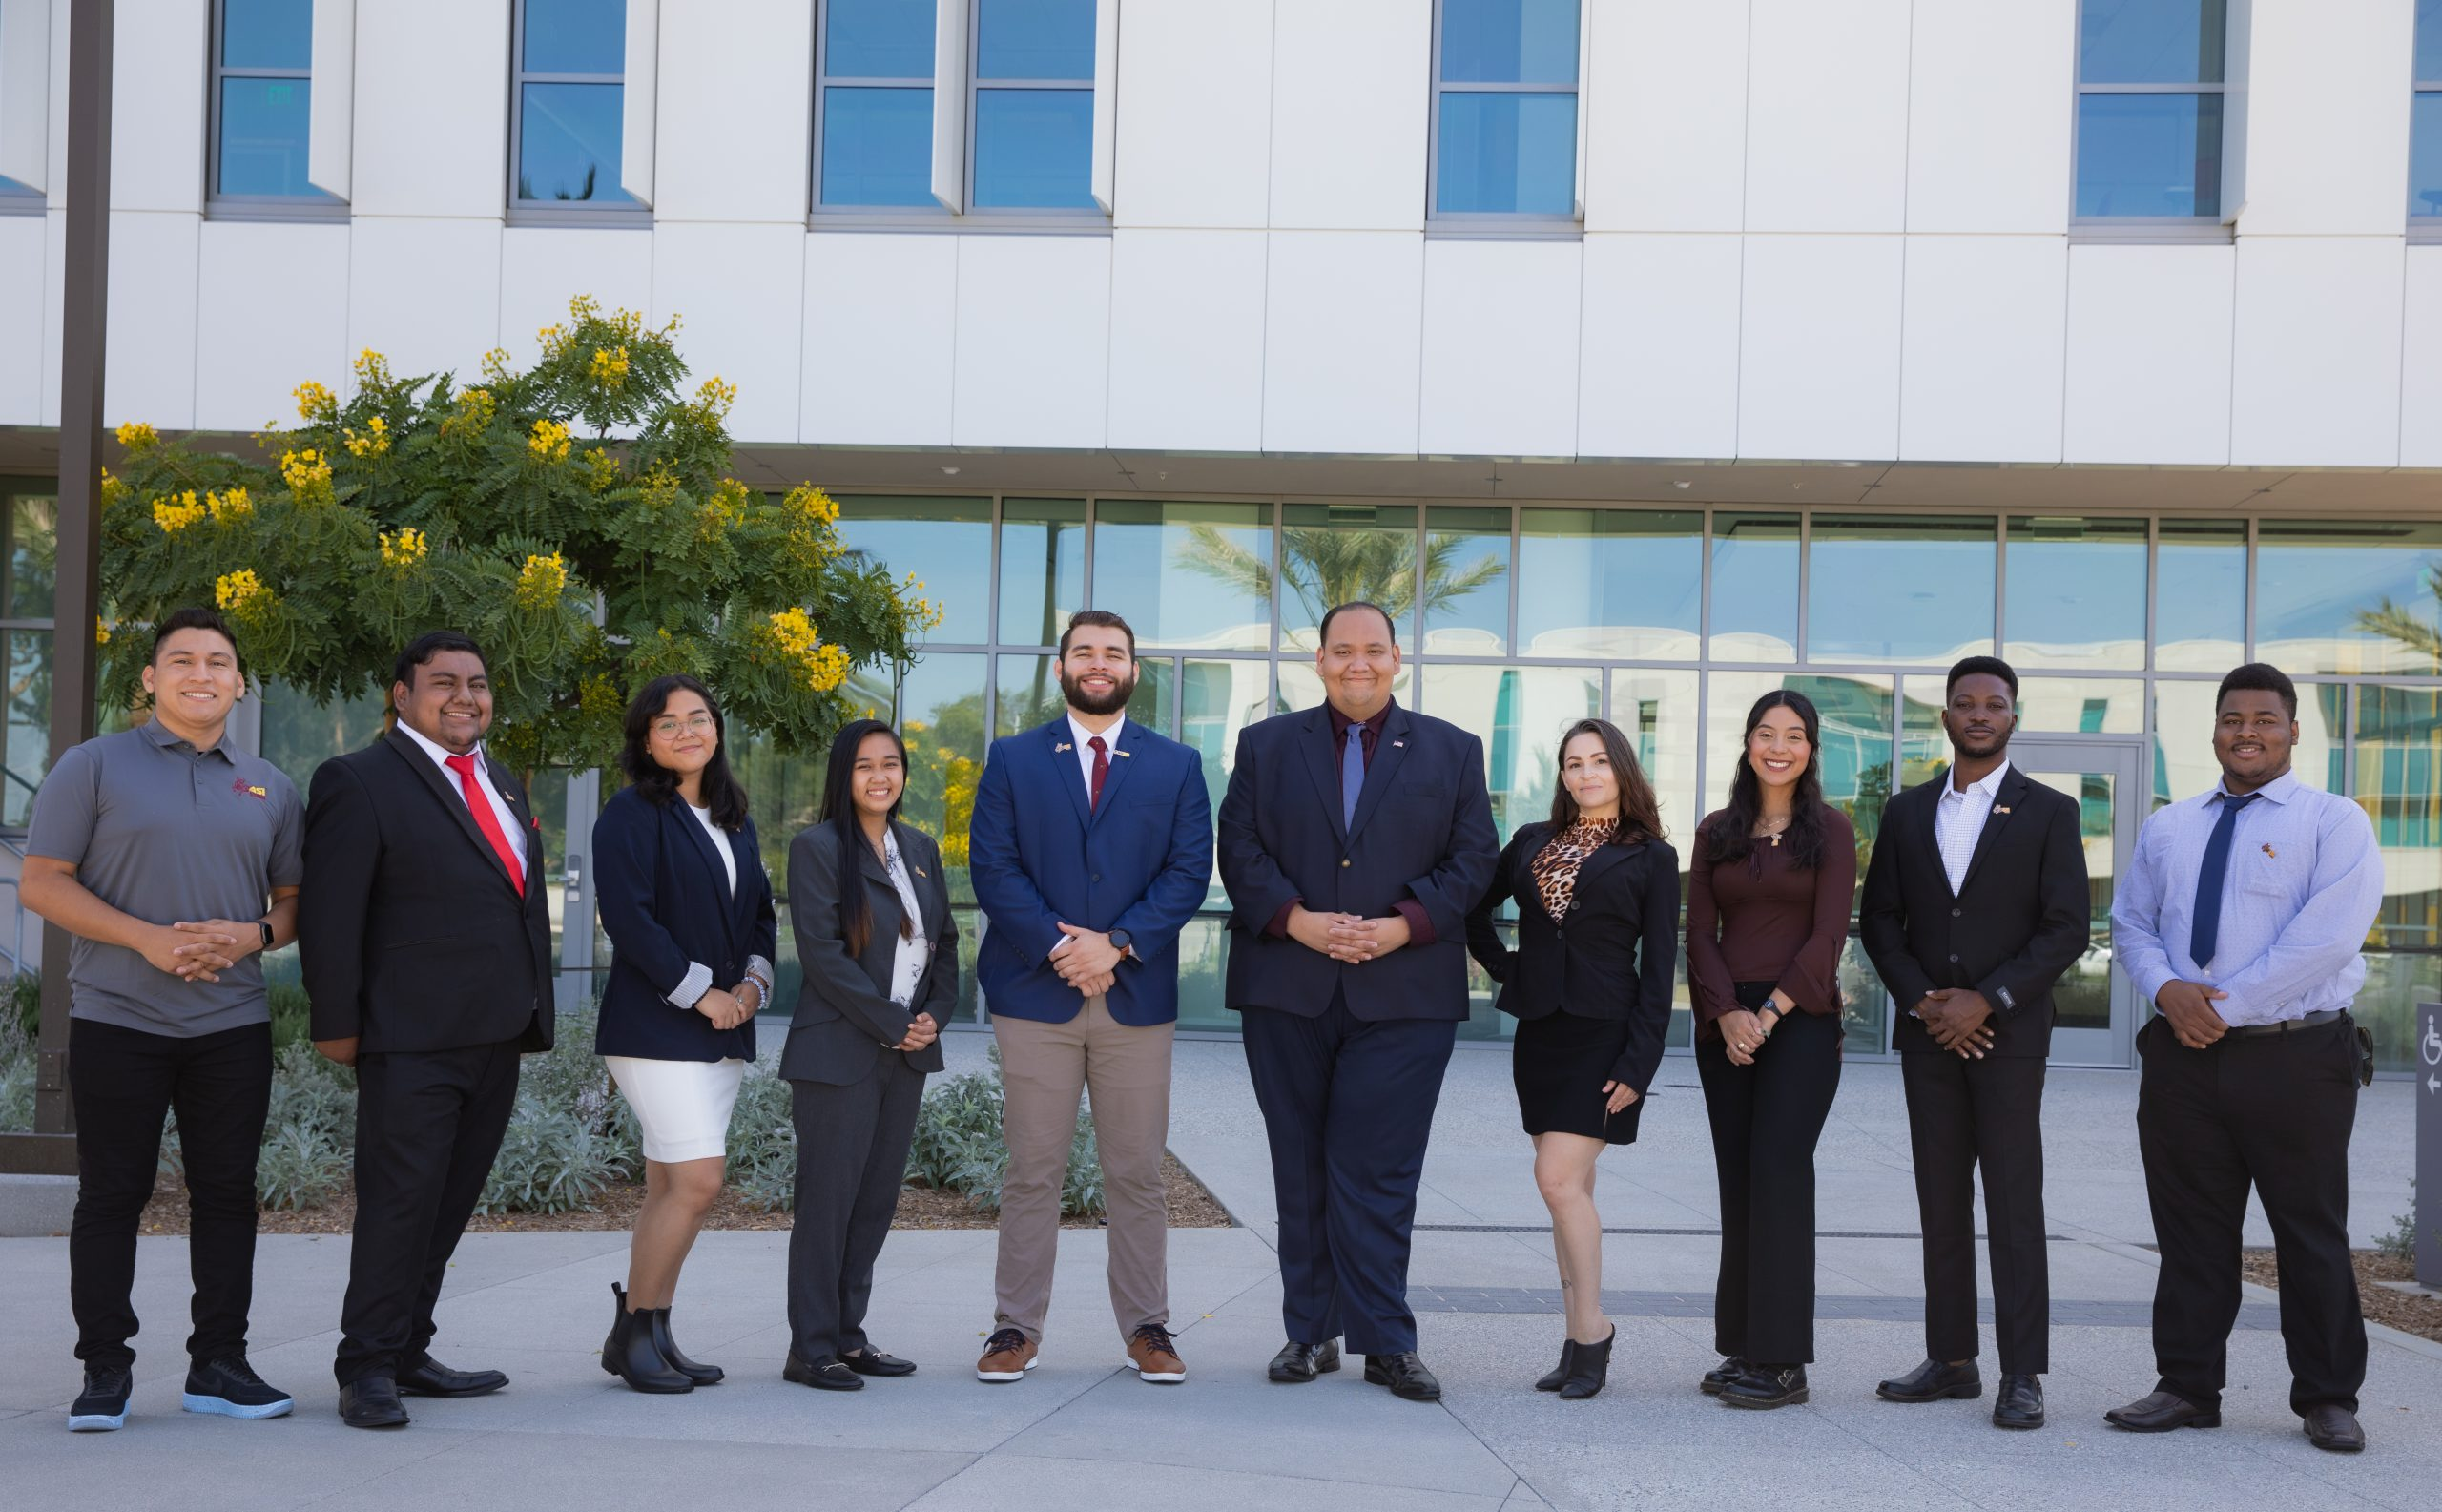 The official student voice of CSU Dominguez Hills